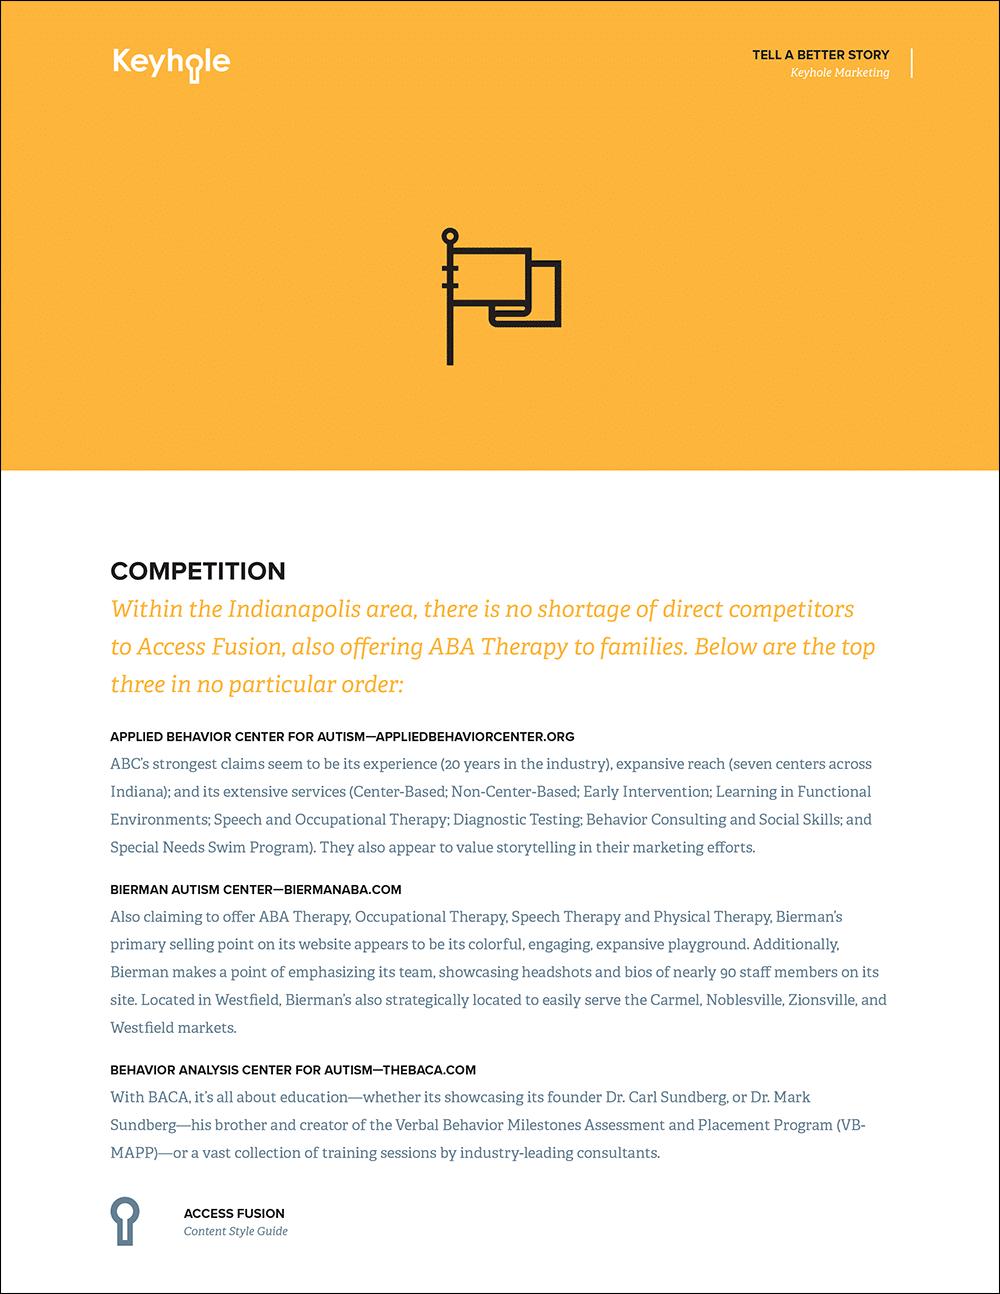 KeyholeMarketing_ContentStyleGuide_Template-5